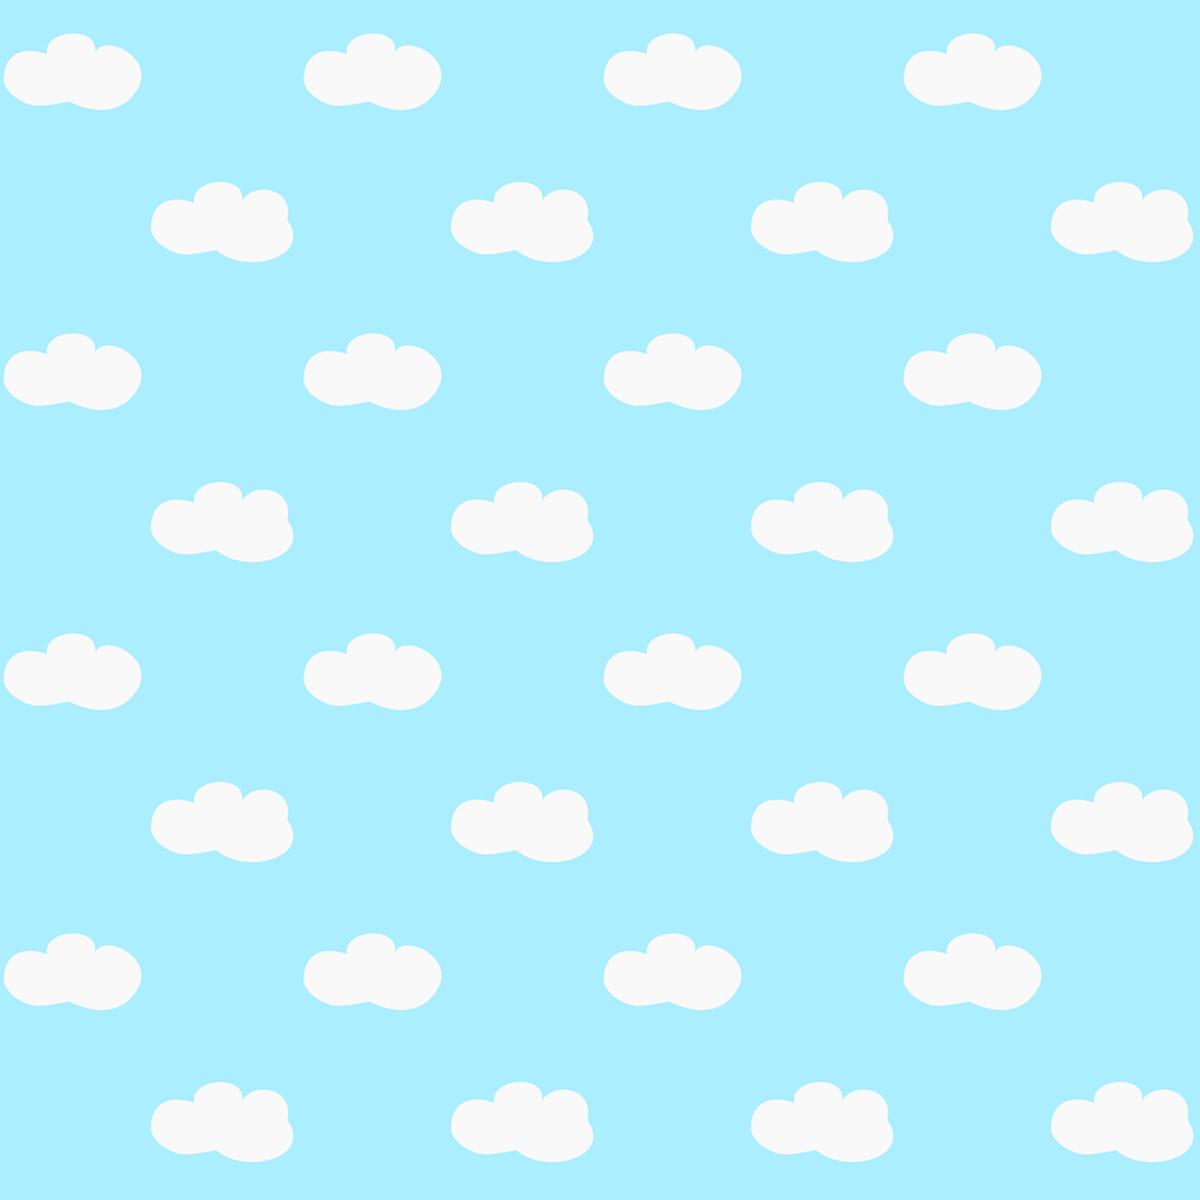 Scrapbook paper designs - Free Printable Fluffy Clouds Pattern Paper Scrapbook